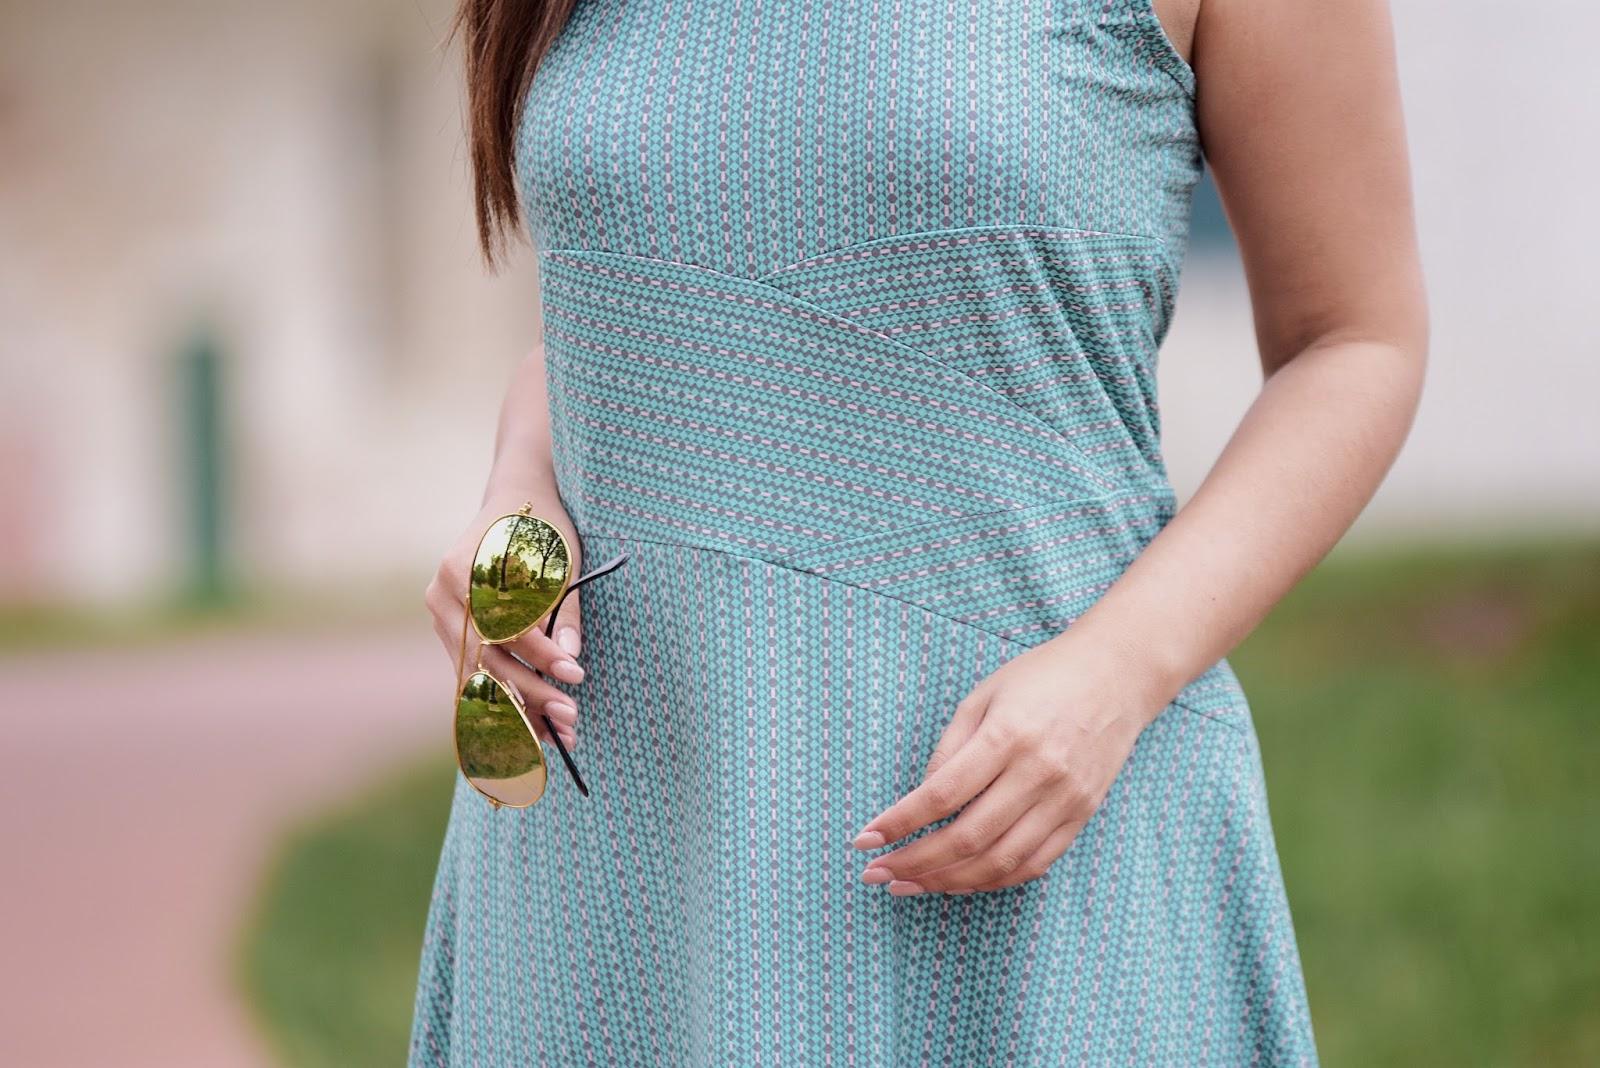 prAna-weallgrow-latinabloggers-mariestilo-fashionblogger-moda-dcblogger-streetstyle-greenery